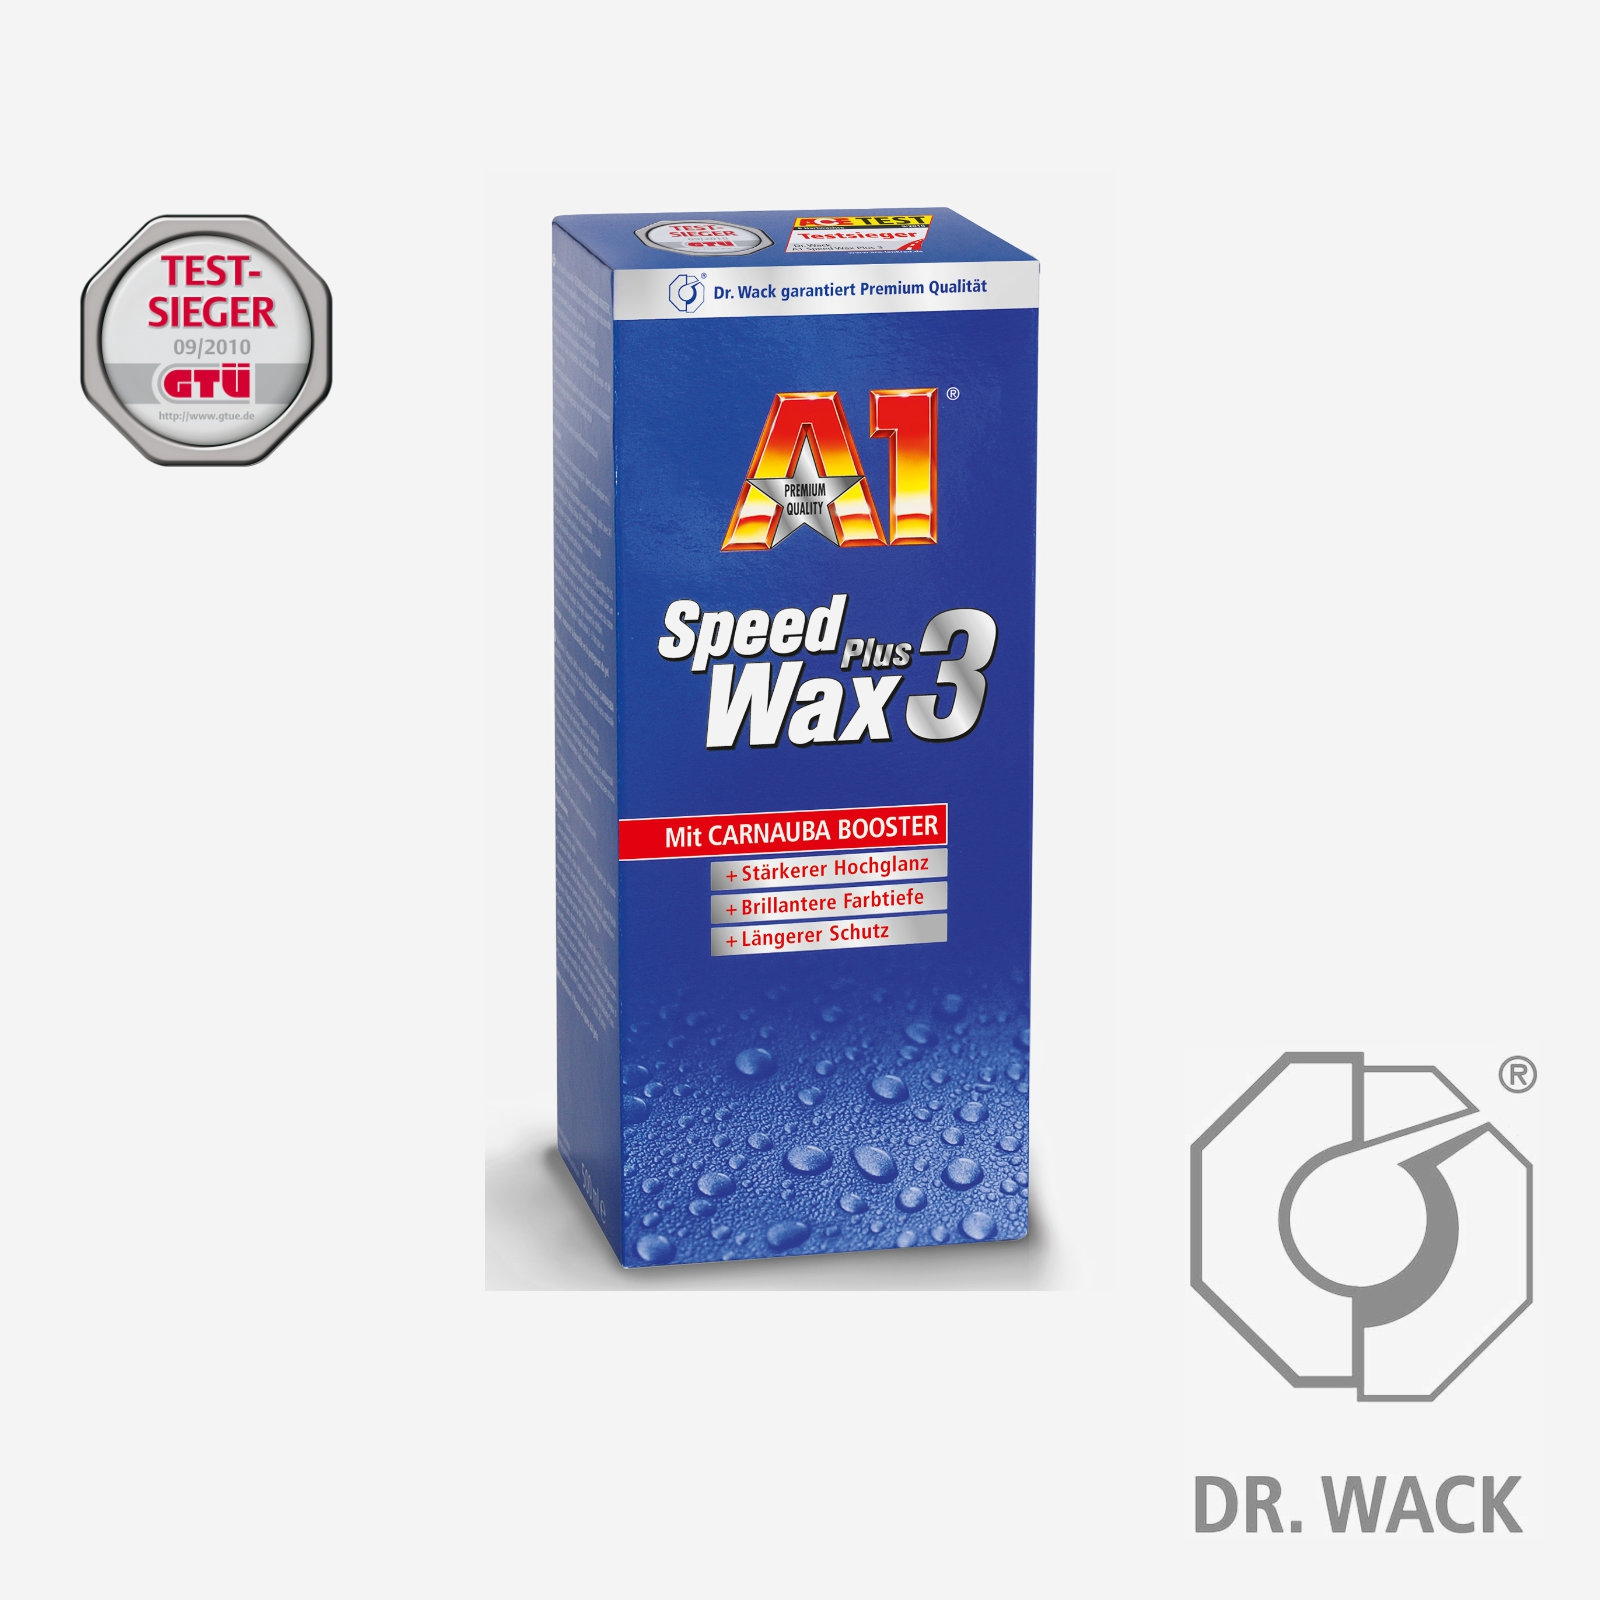 dr wack a1 speed wax plus 3 500ml. Black Bedroom Furniture Sets. Home Design Ideas